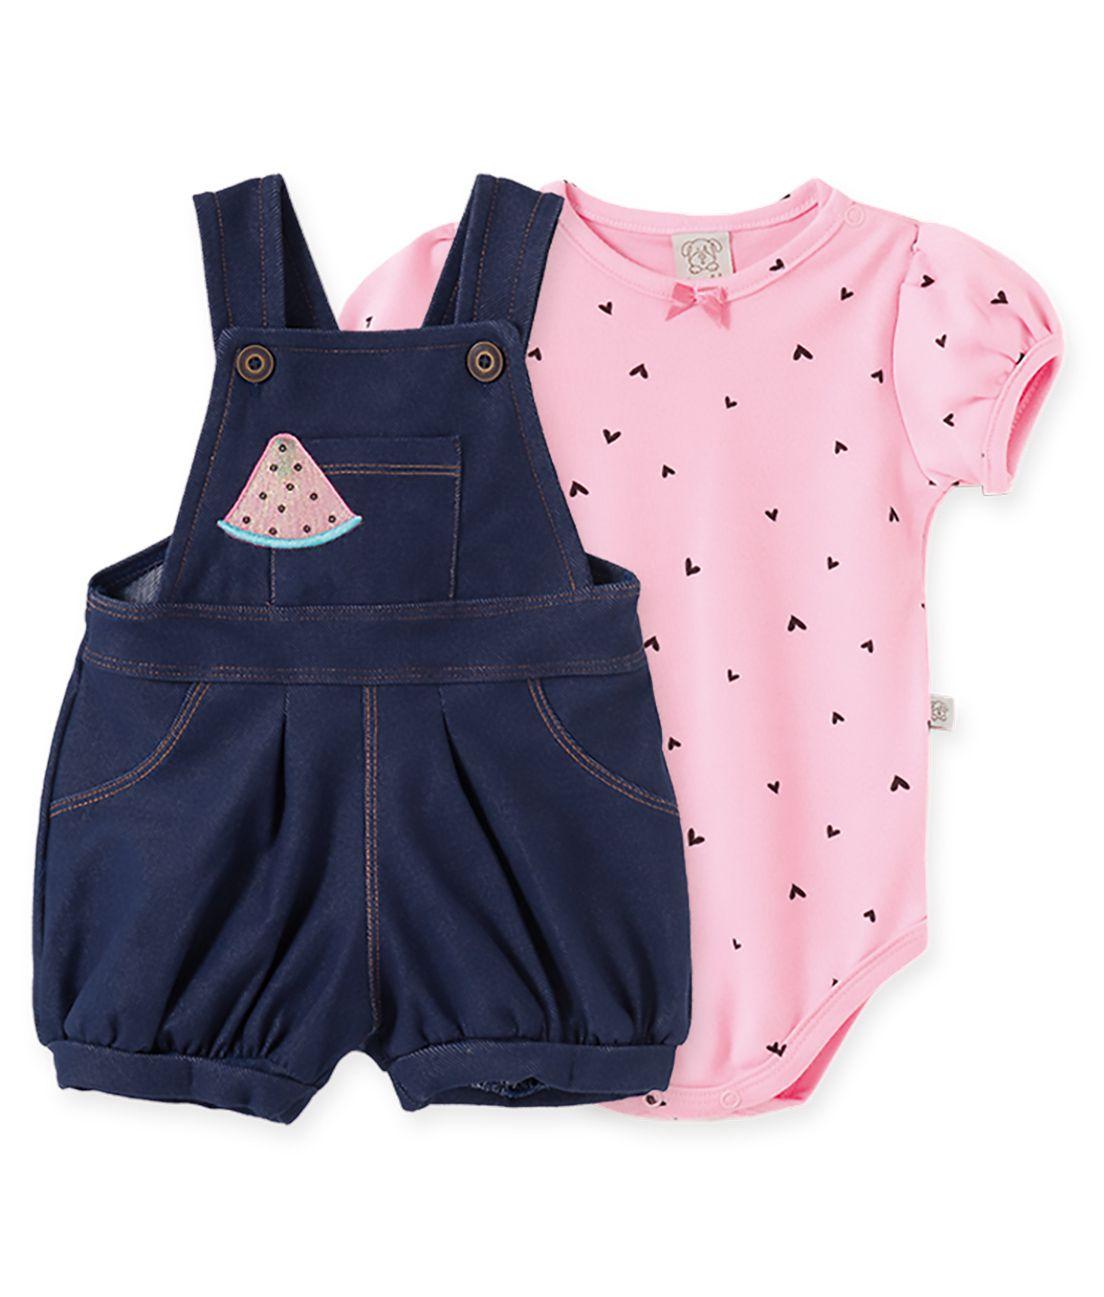 Conjunto Infantil Jardineira cotton Jeans e body  manga curta balonê Pingo Lelê Melancia  Rosa